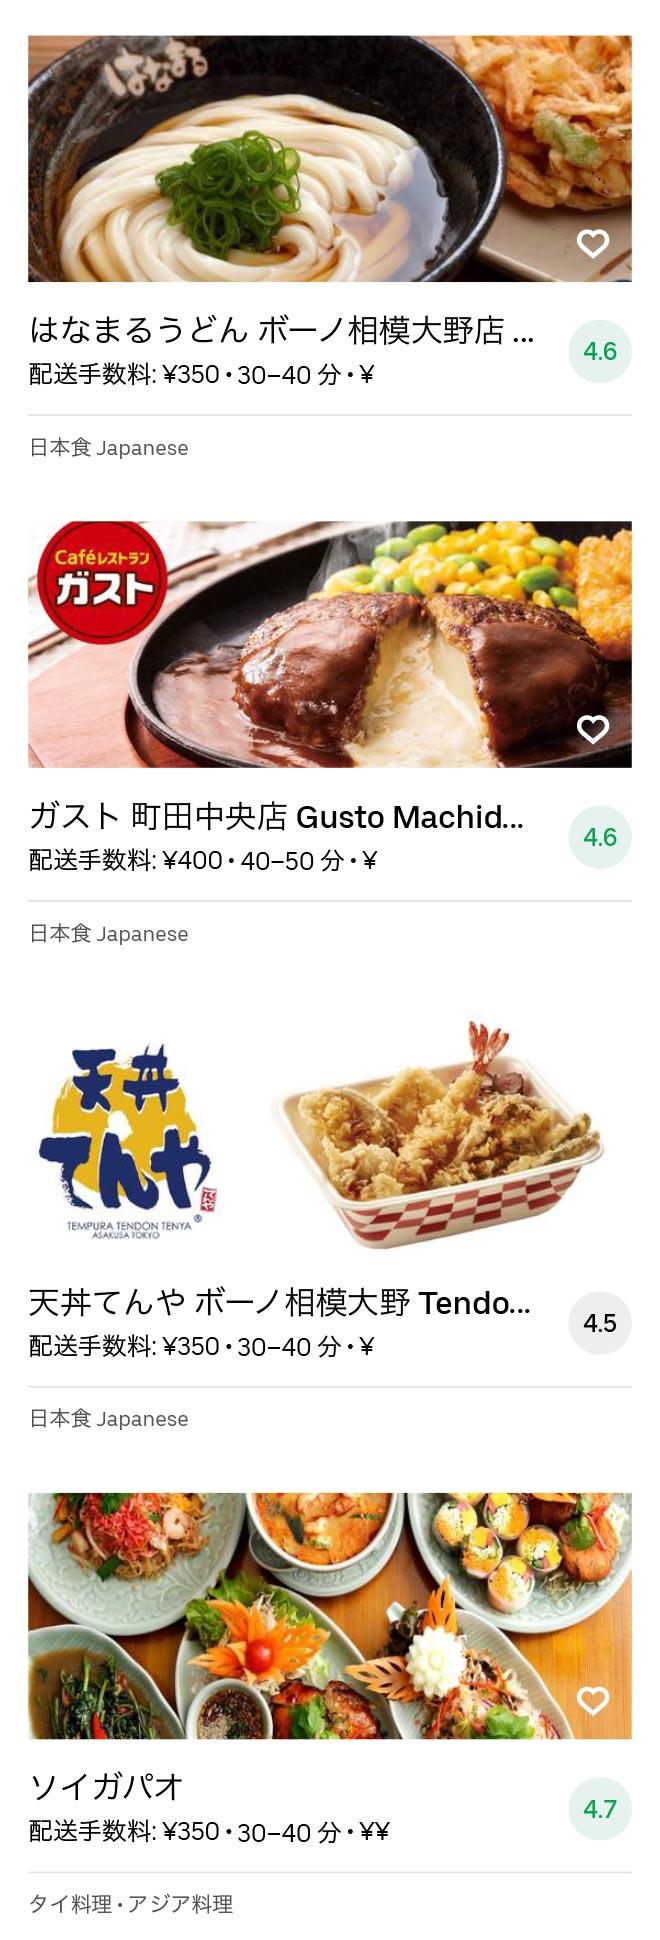 Chuo rinkan menu 2008 07